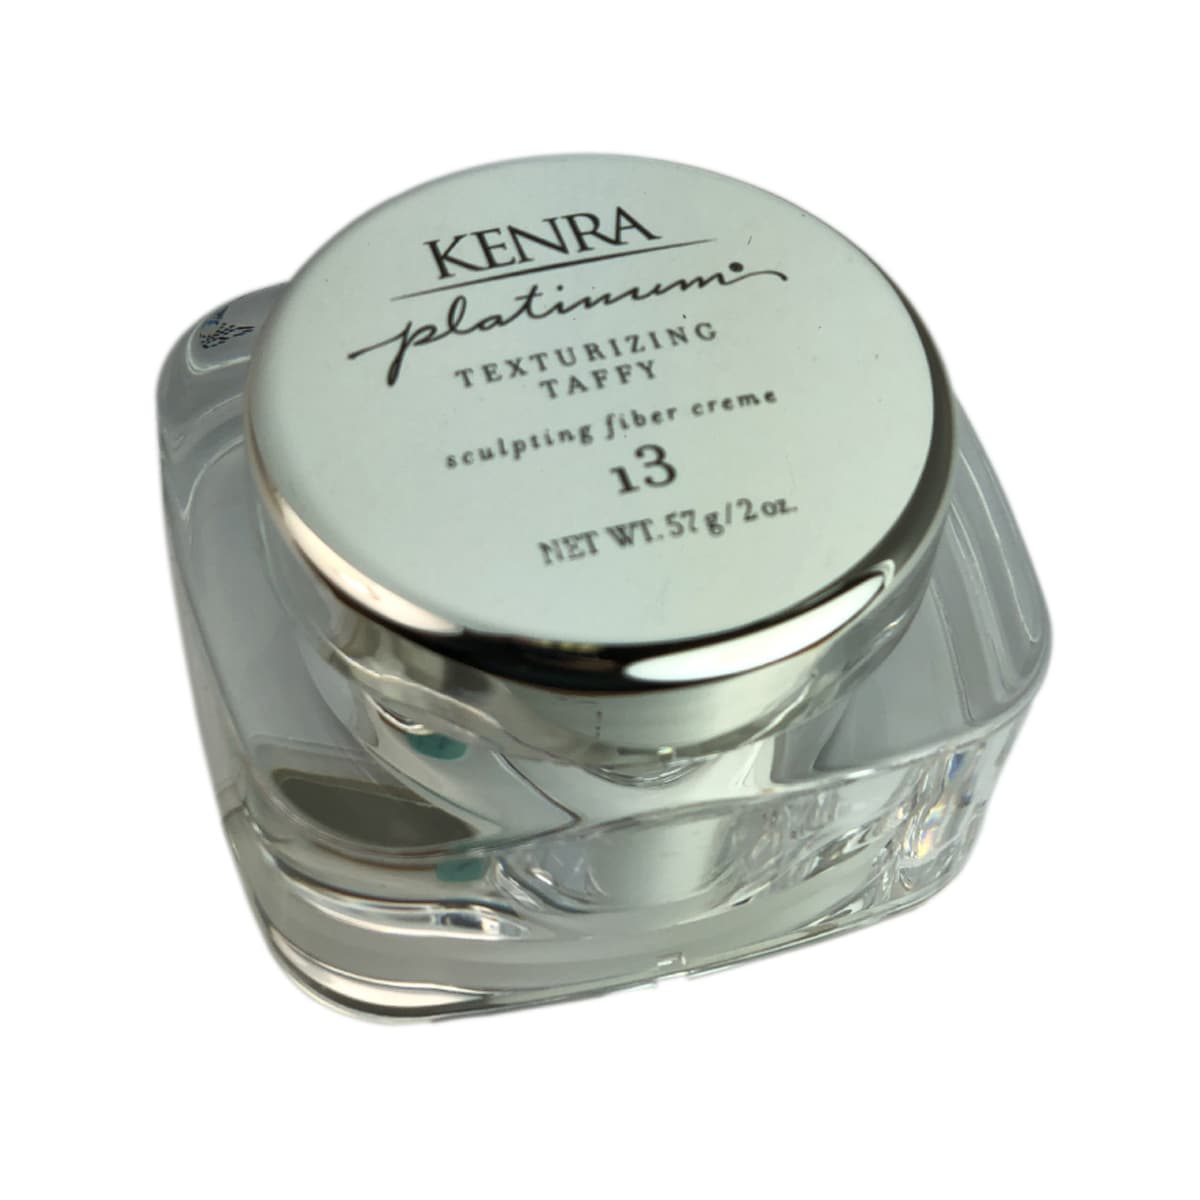 Kenra Platinum (White) 2-ounce Texturizing Taffy (2-ounce)